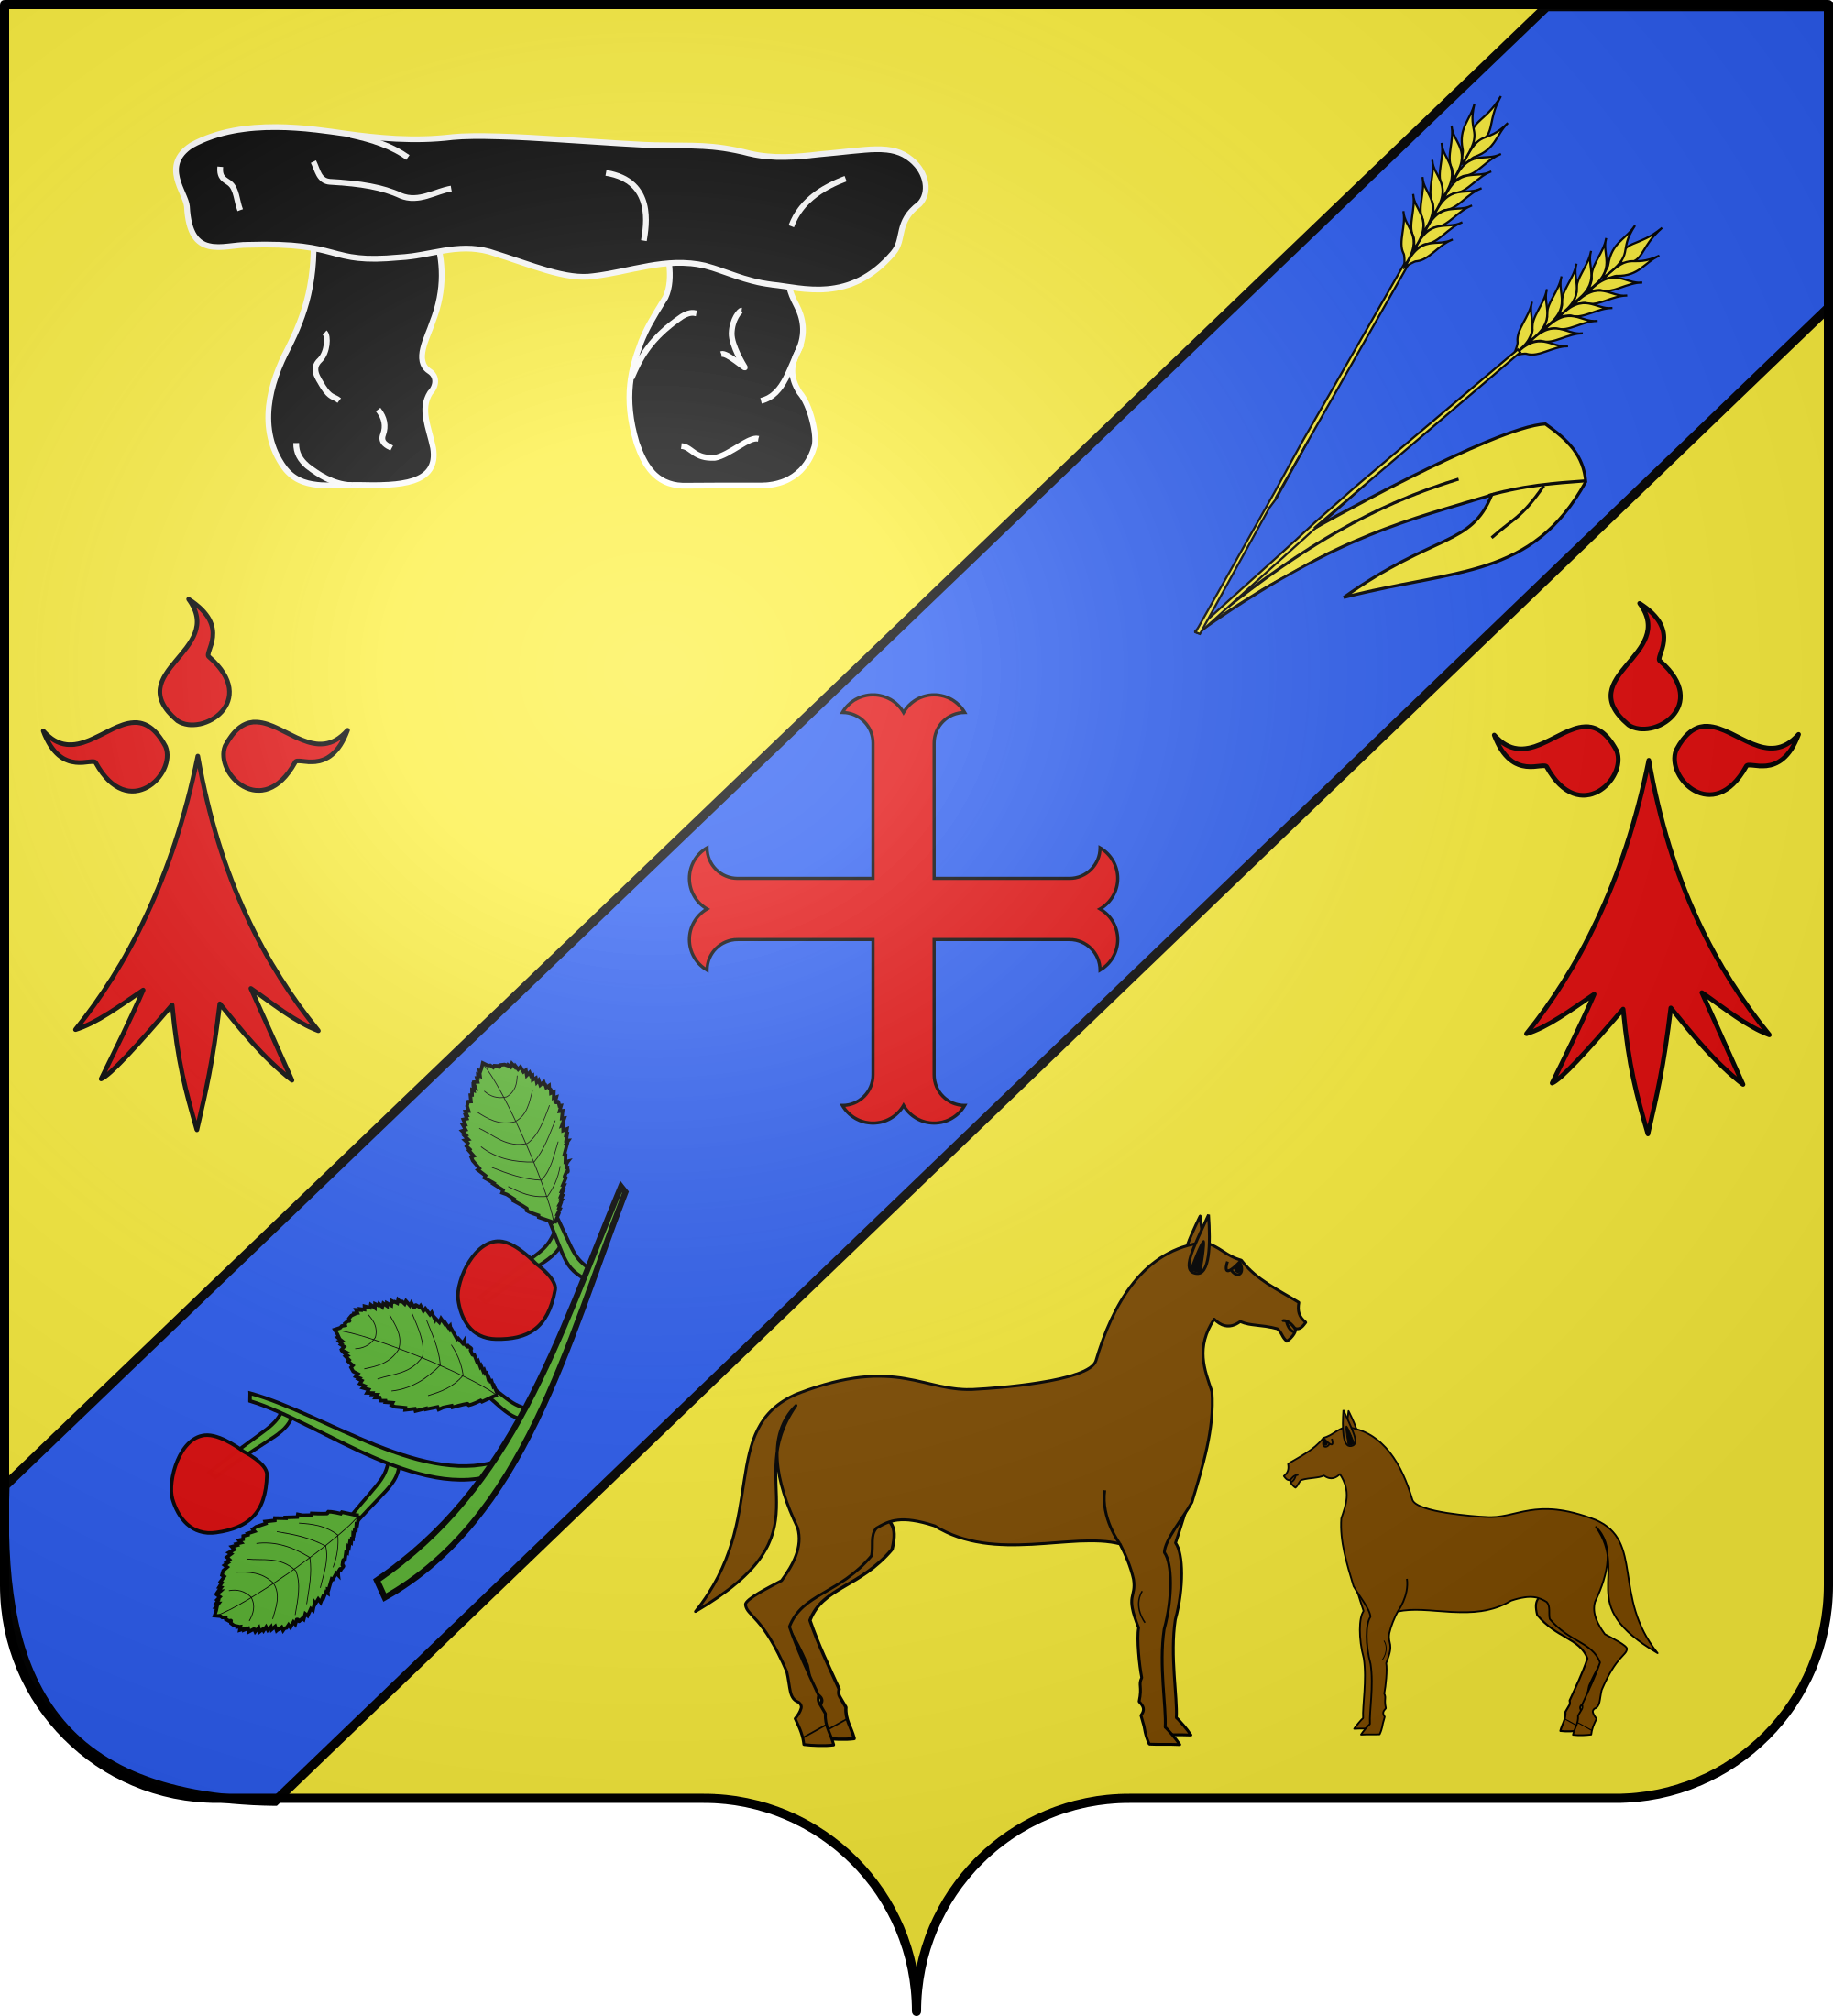 File:Blason Hénanbihen (Côtes.